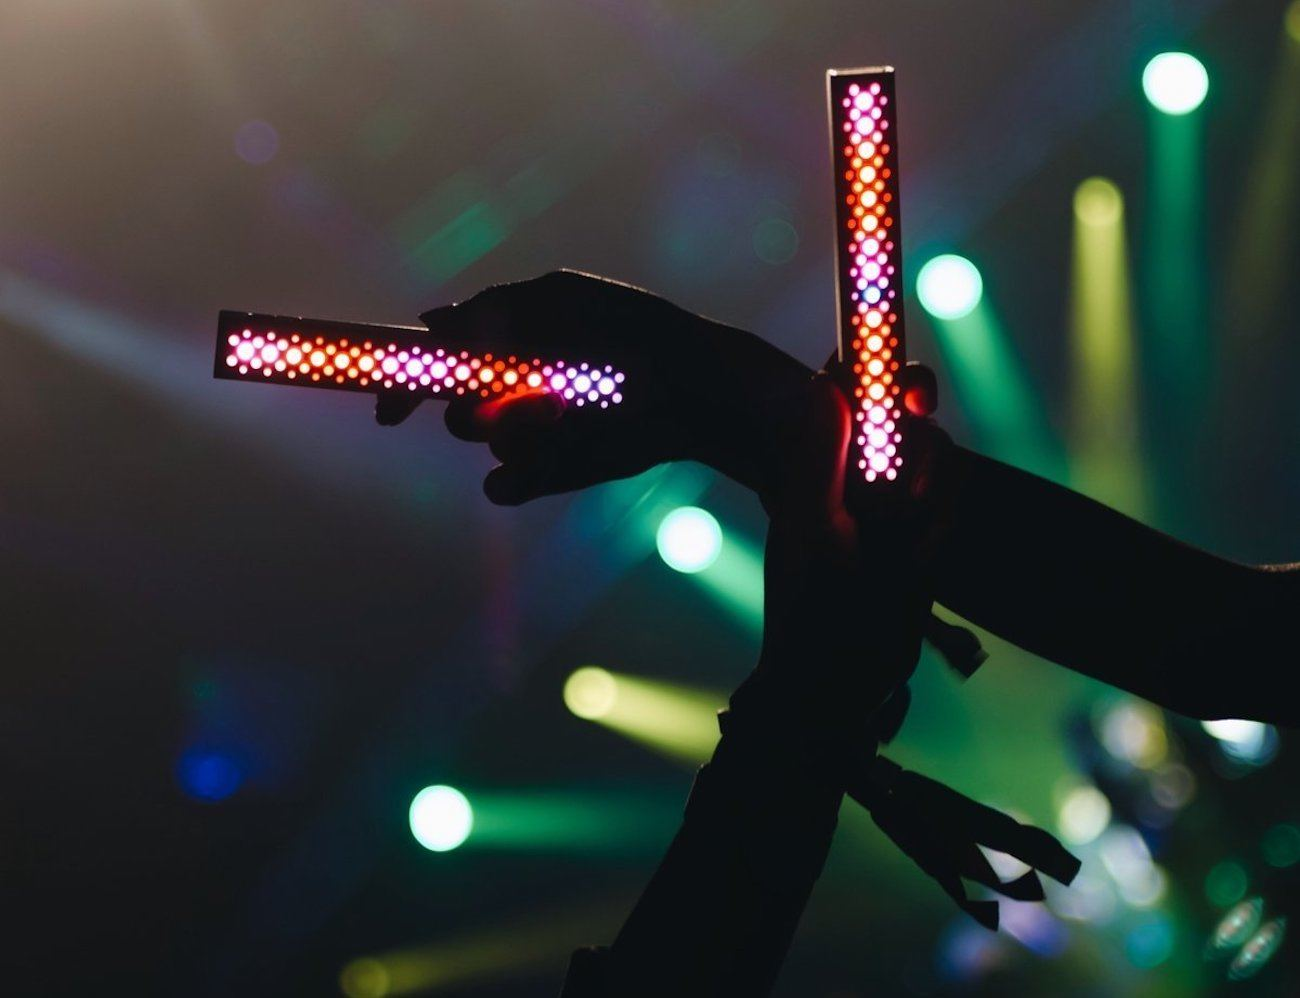 Mstick Portable LED Light